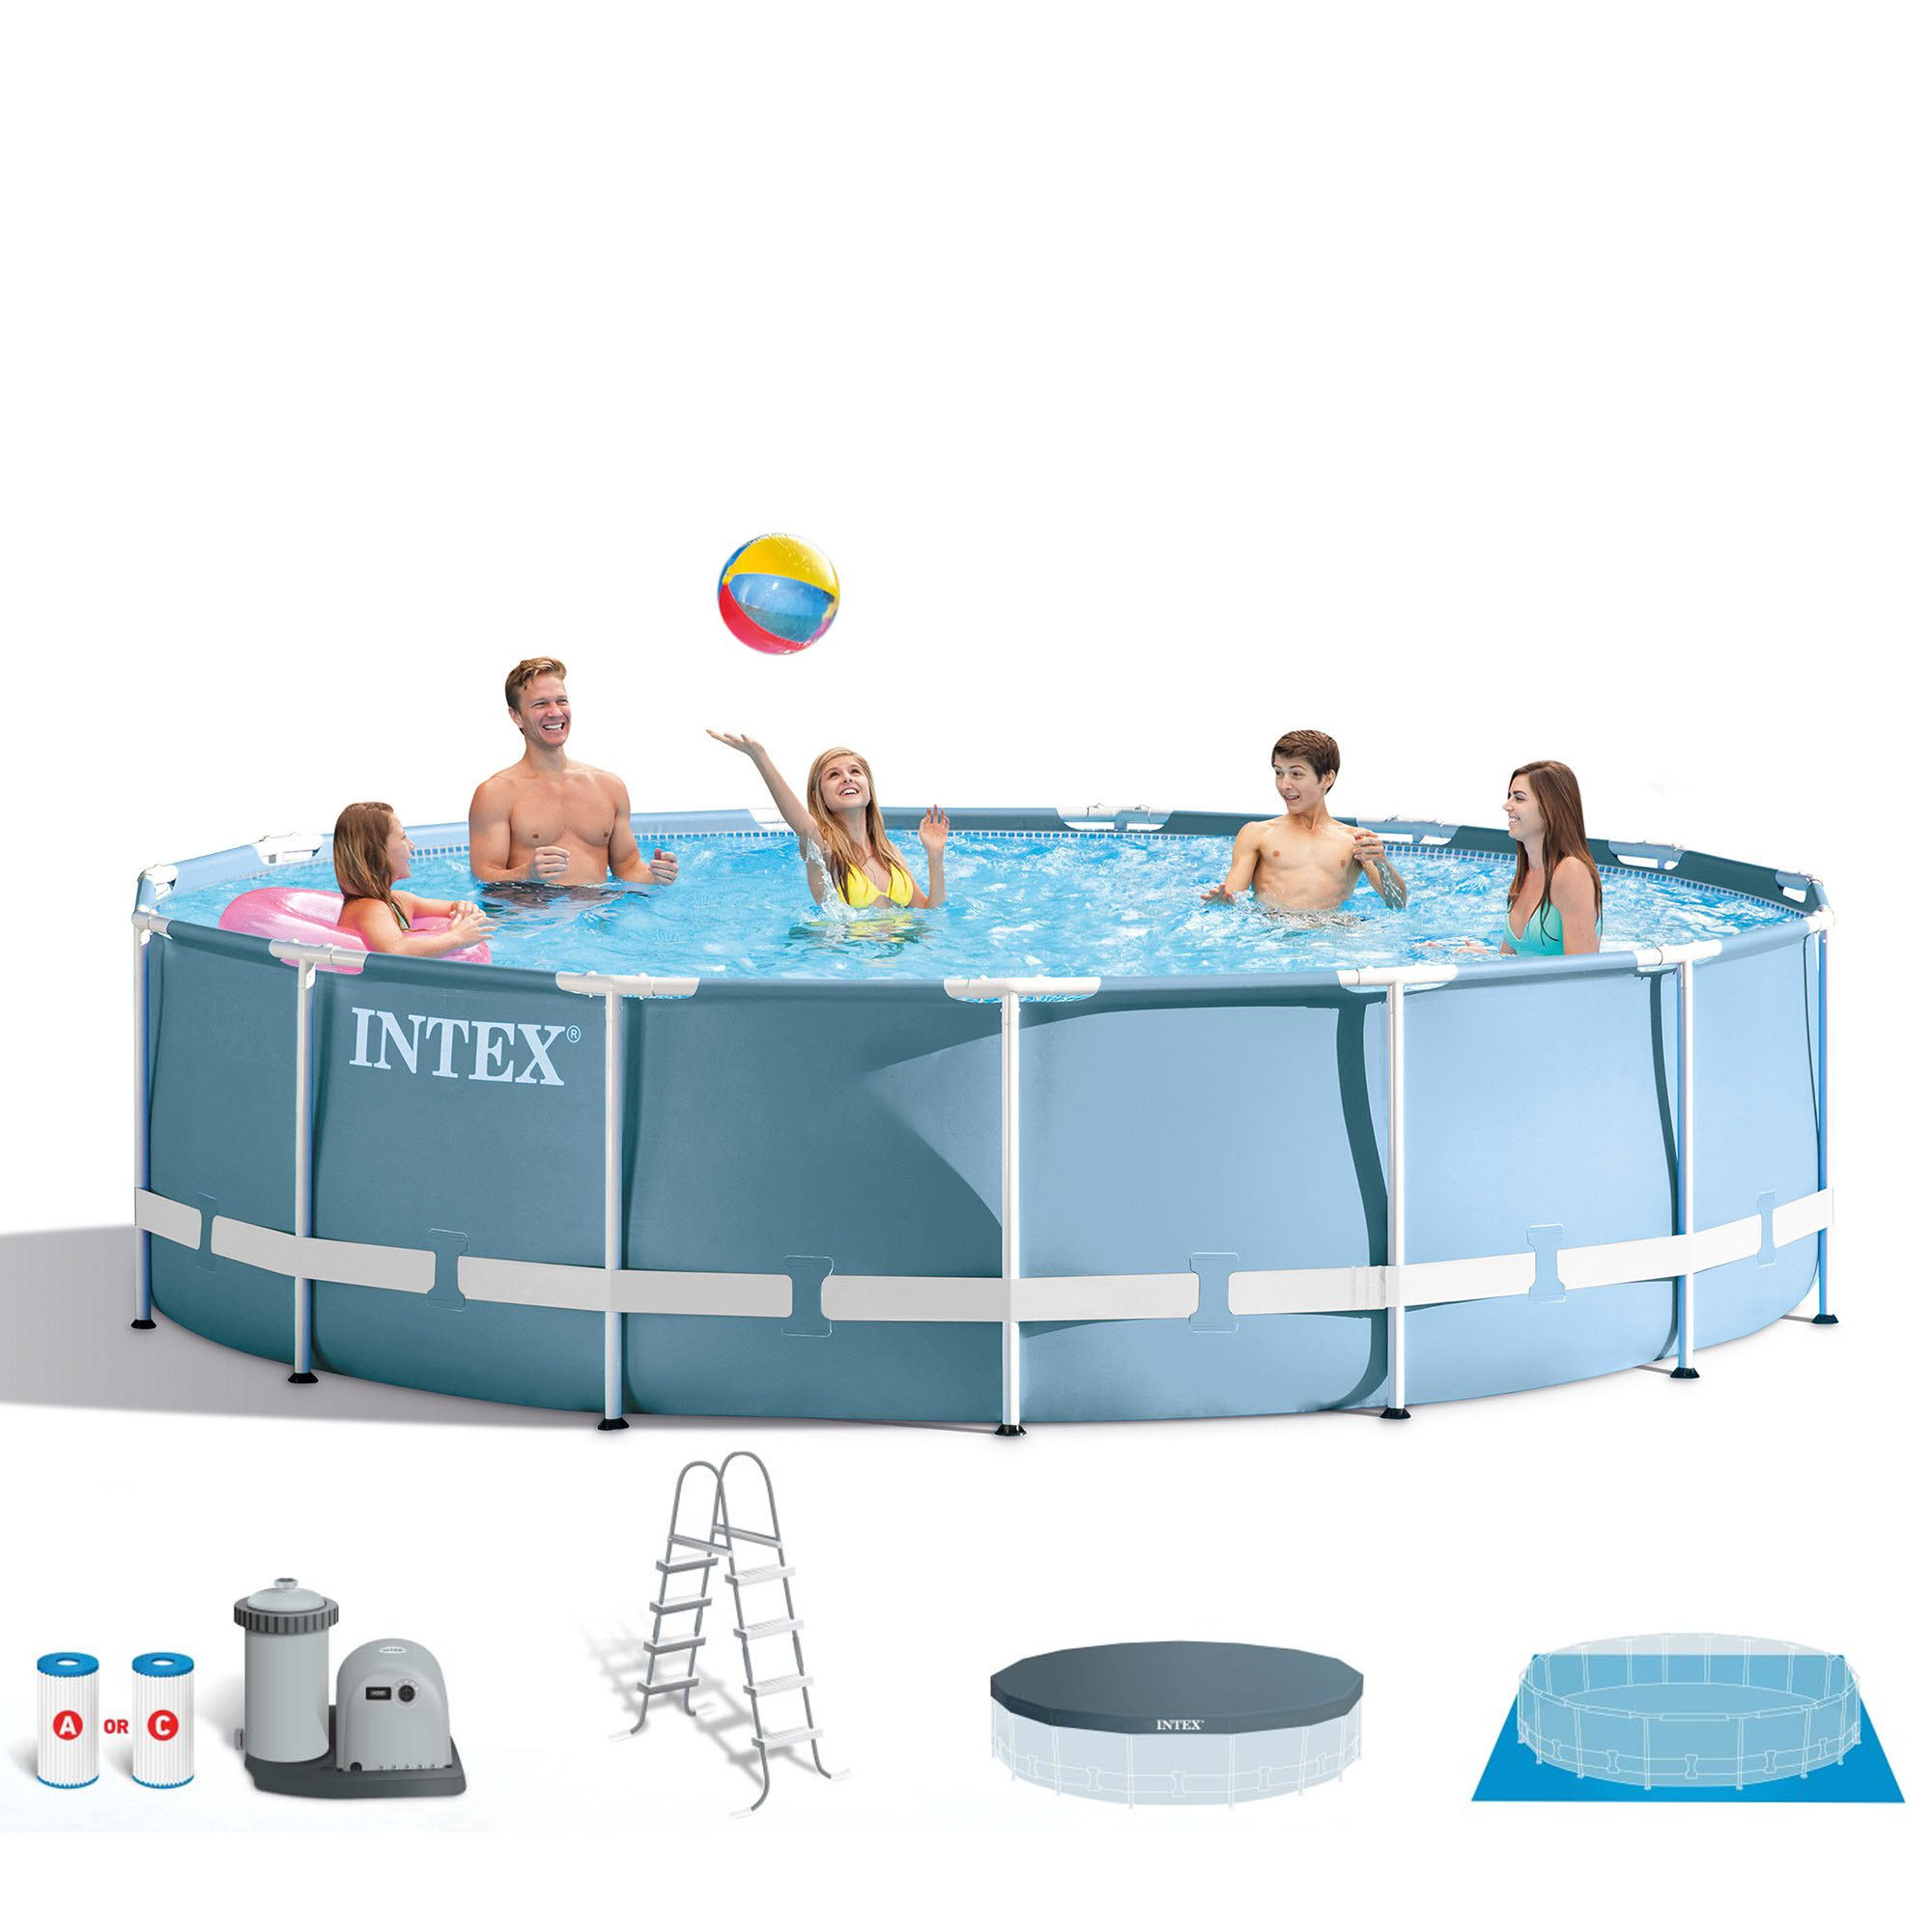 intex 18 feet x 48 inches prism frame pool set w ladder cover pump 26751eh 78257322466 ebay. Black Bedroom Furniture Sets. Home Design Ideas